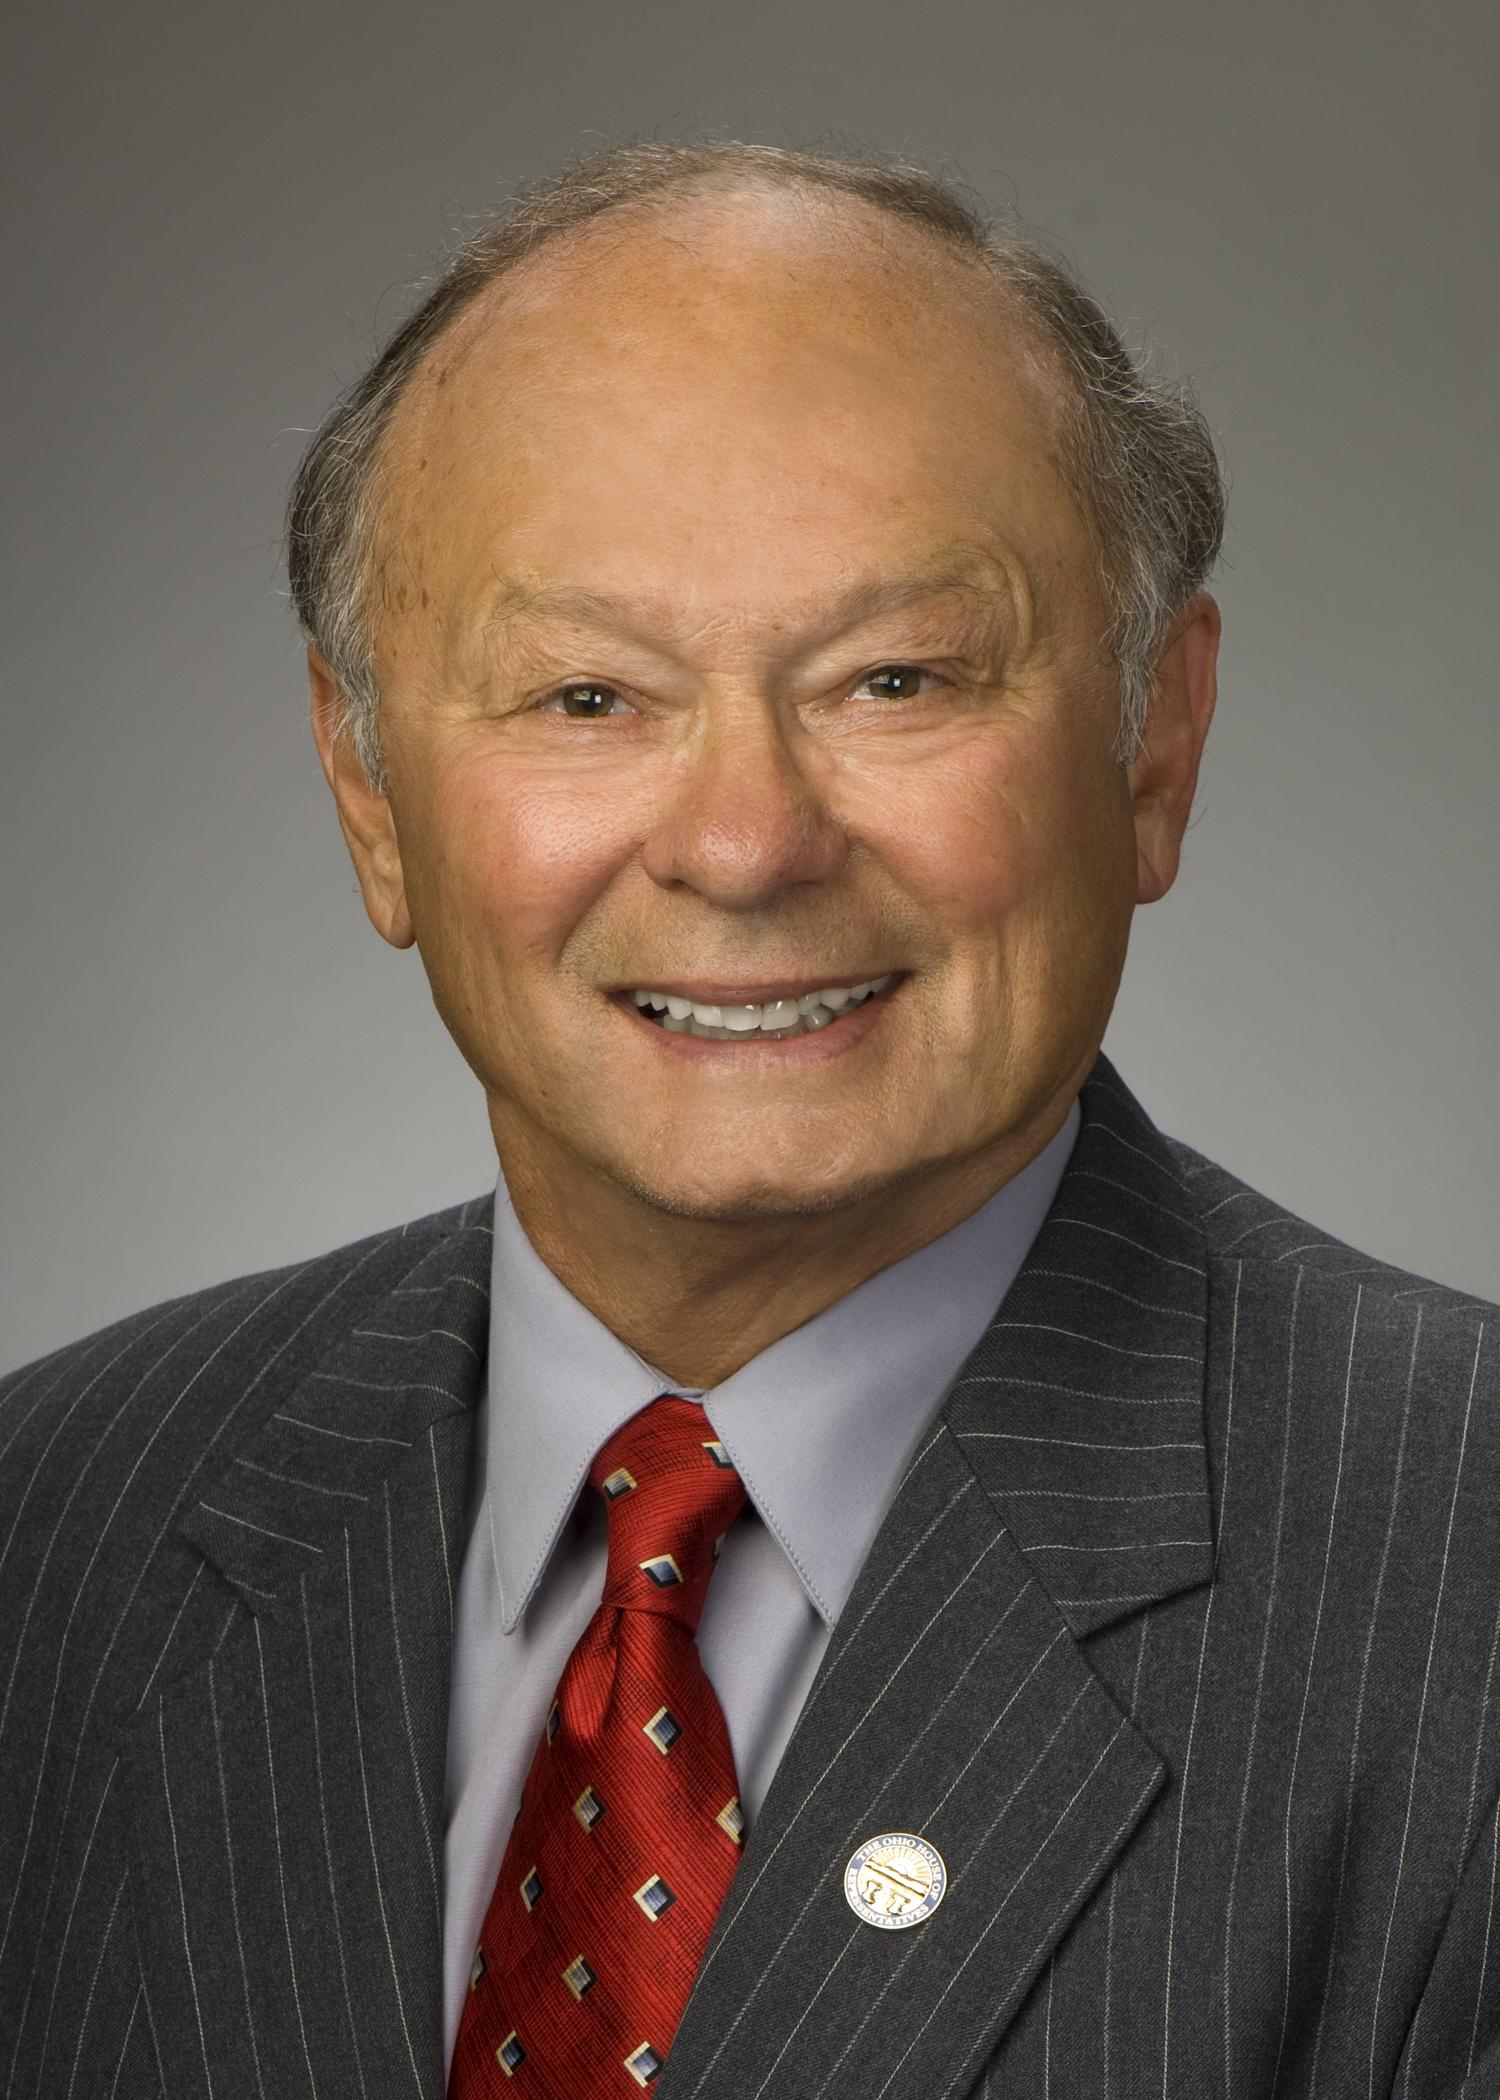 Michael Sheehy, House of Representatives District 46